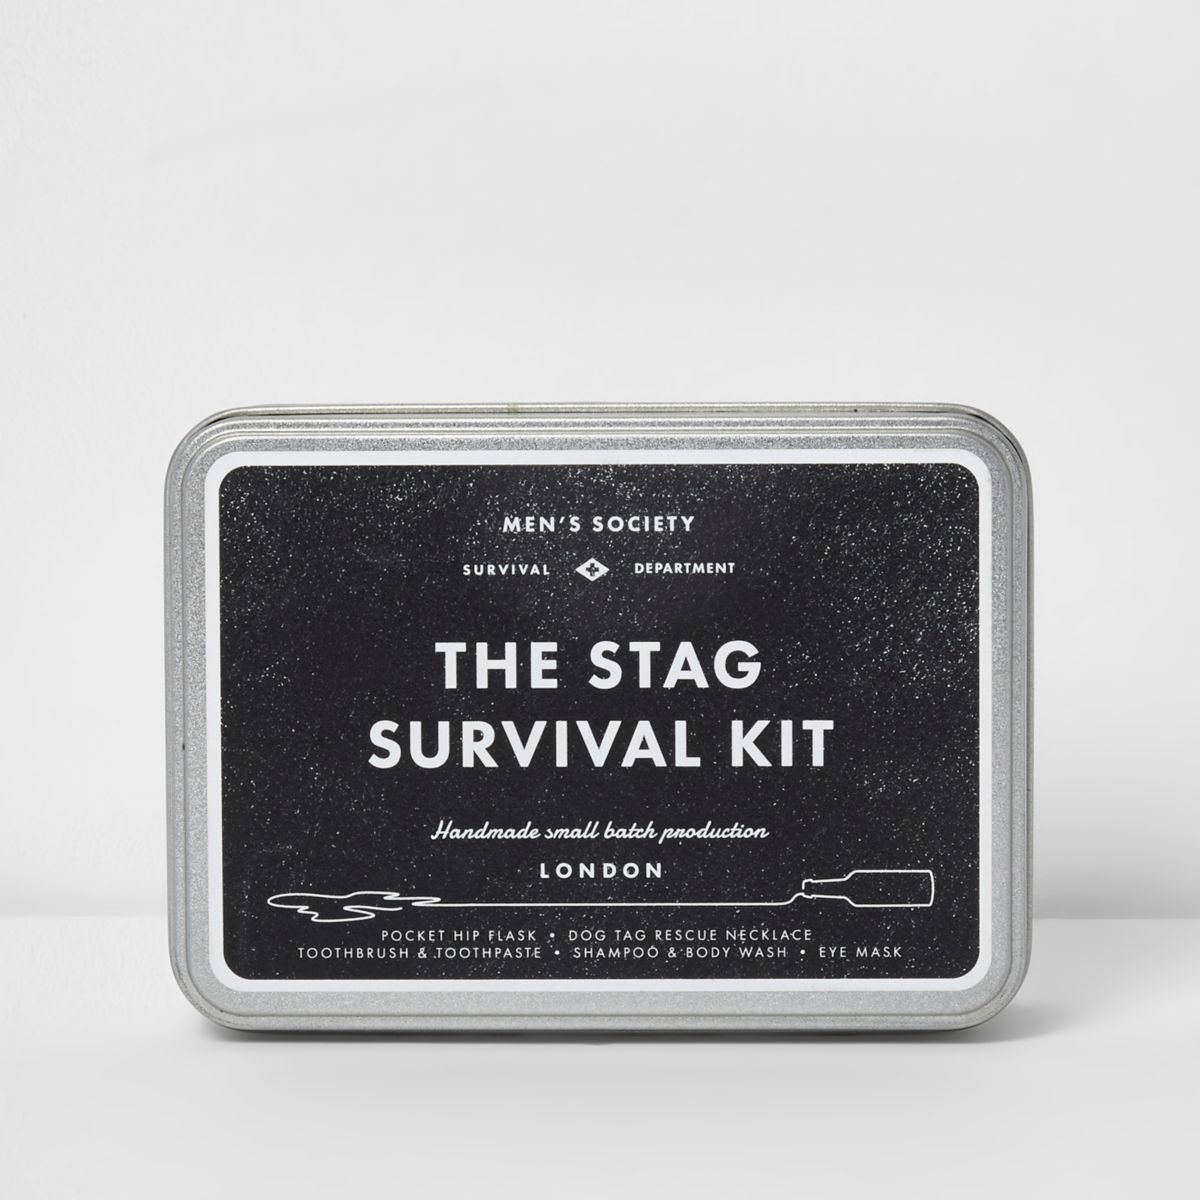 Men's Society 'The Stag Survival Kit'